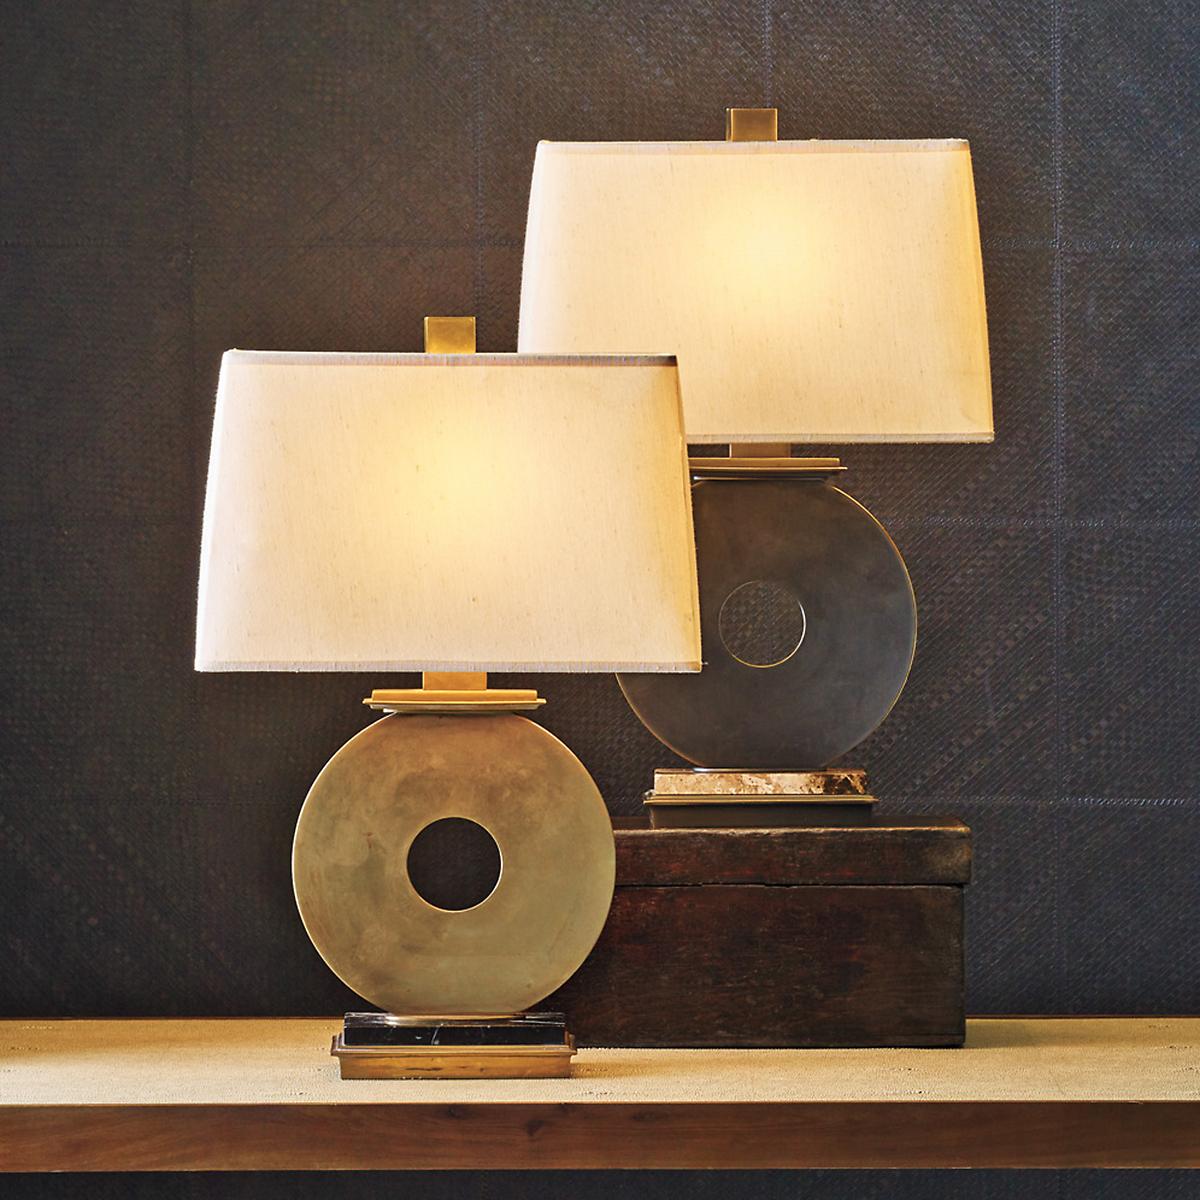 O table lamp